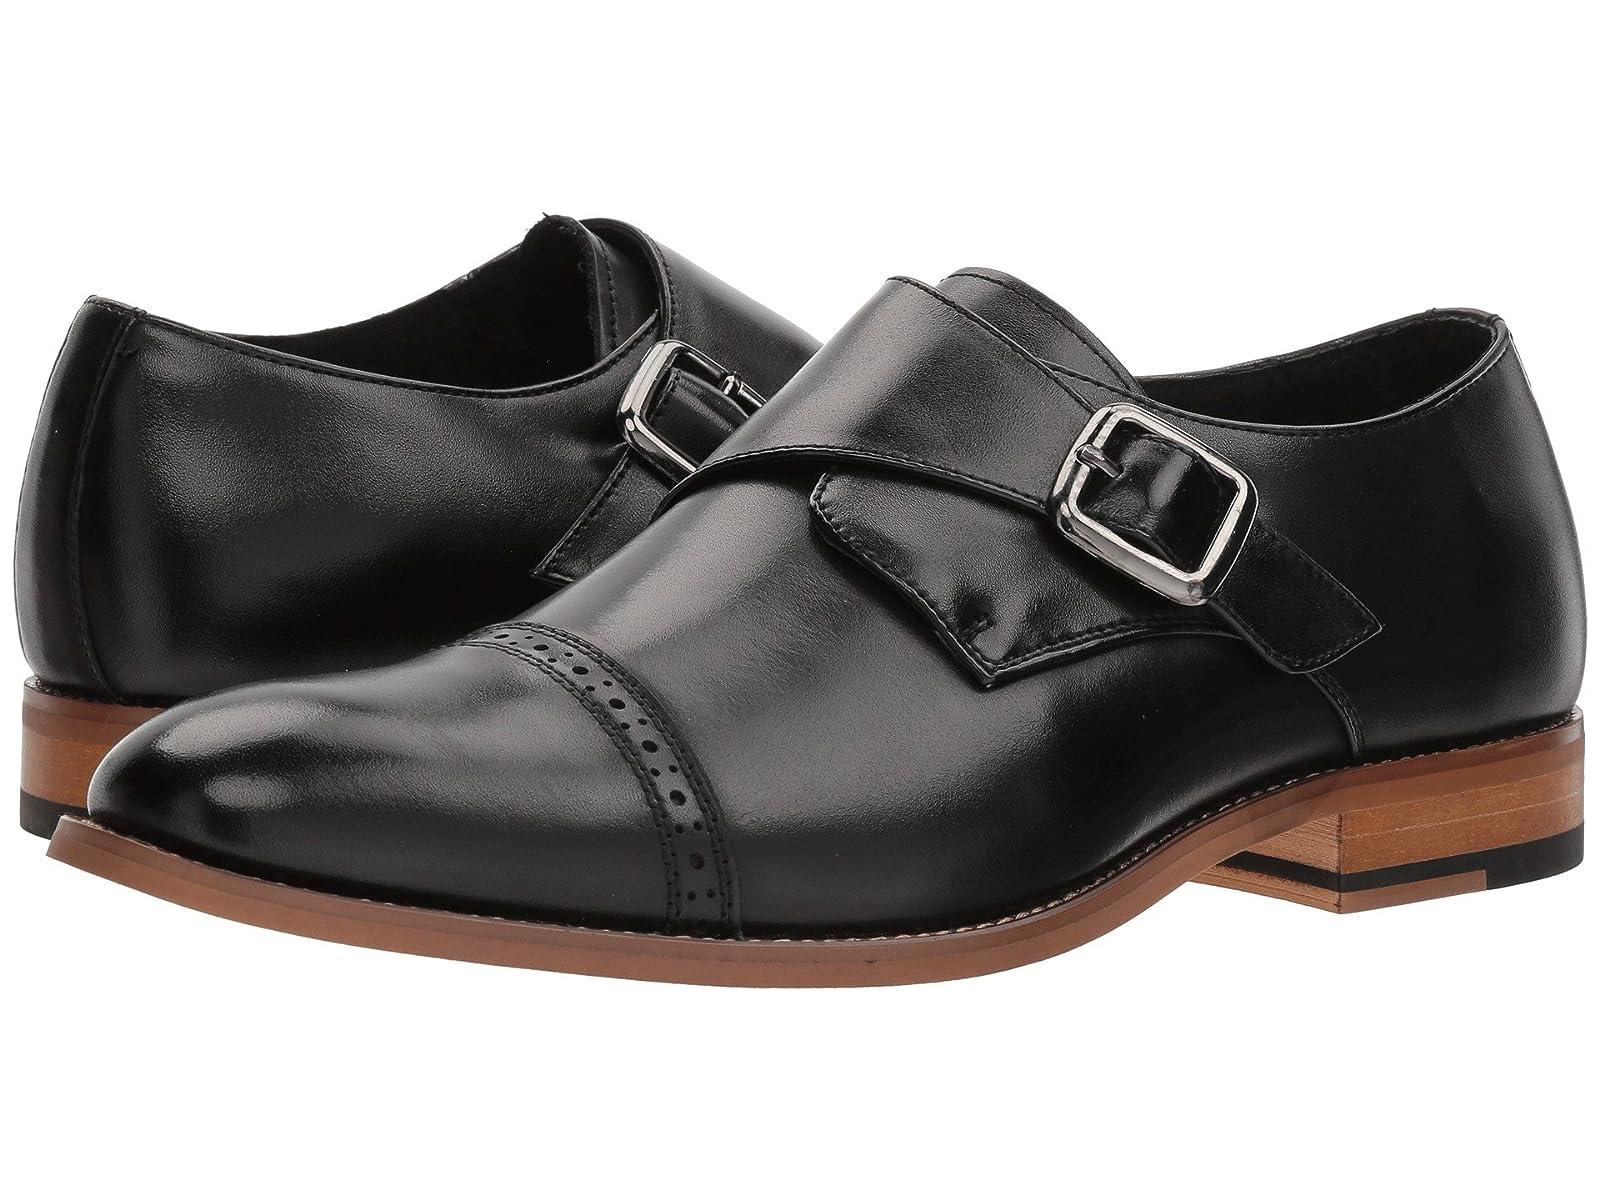 Stacy Adams DesmondAtmospheric grades have affordable shoes